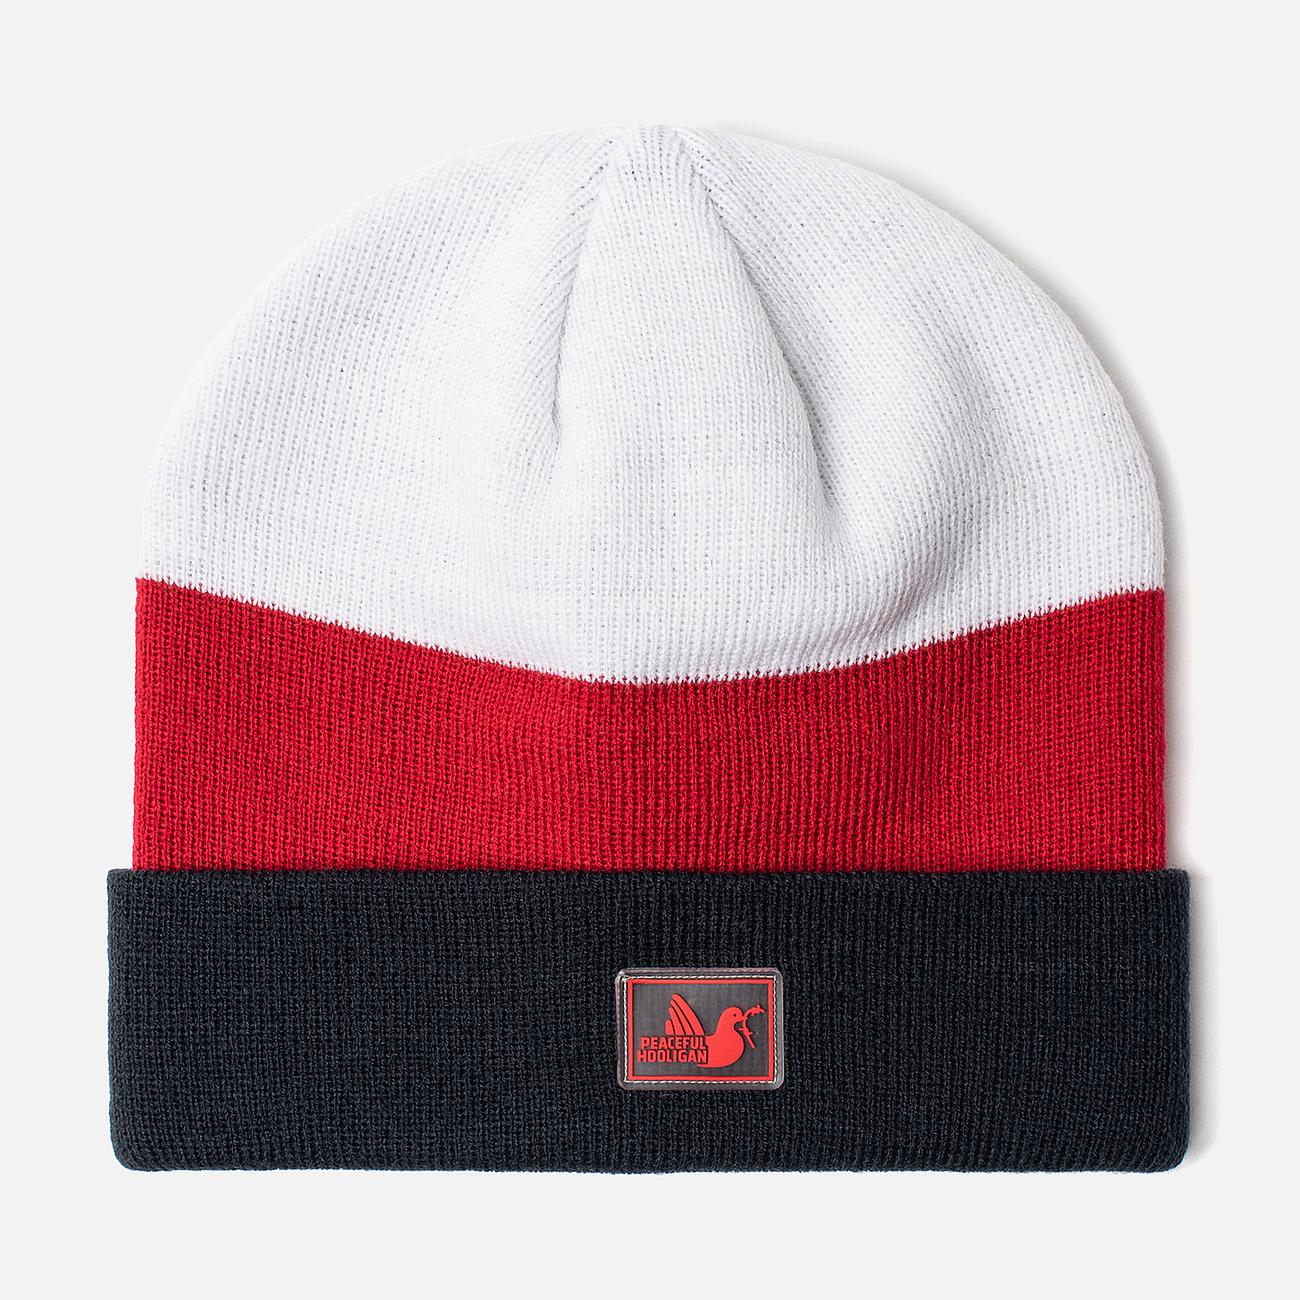 Шапка Peaceful Hooligan Stripe Navy/Red/White